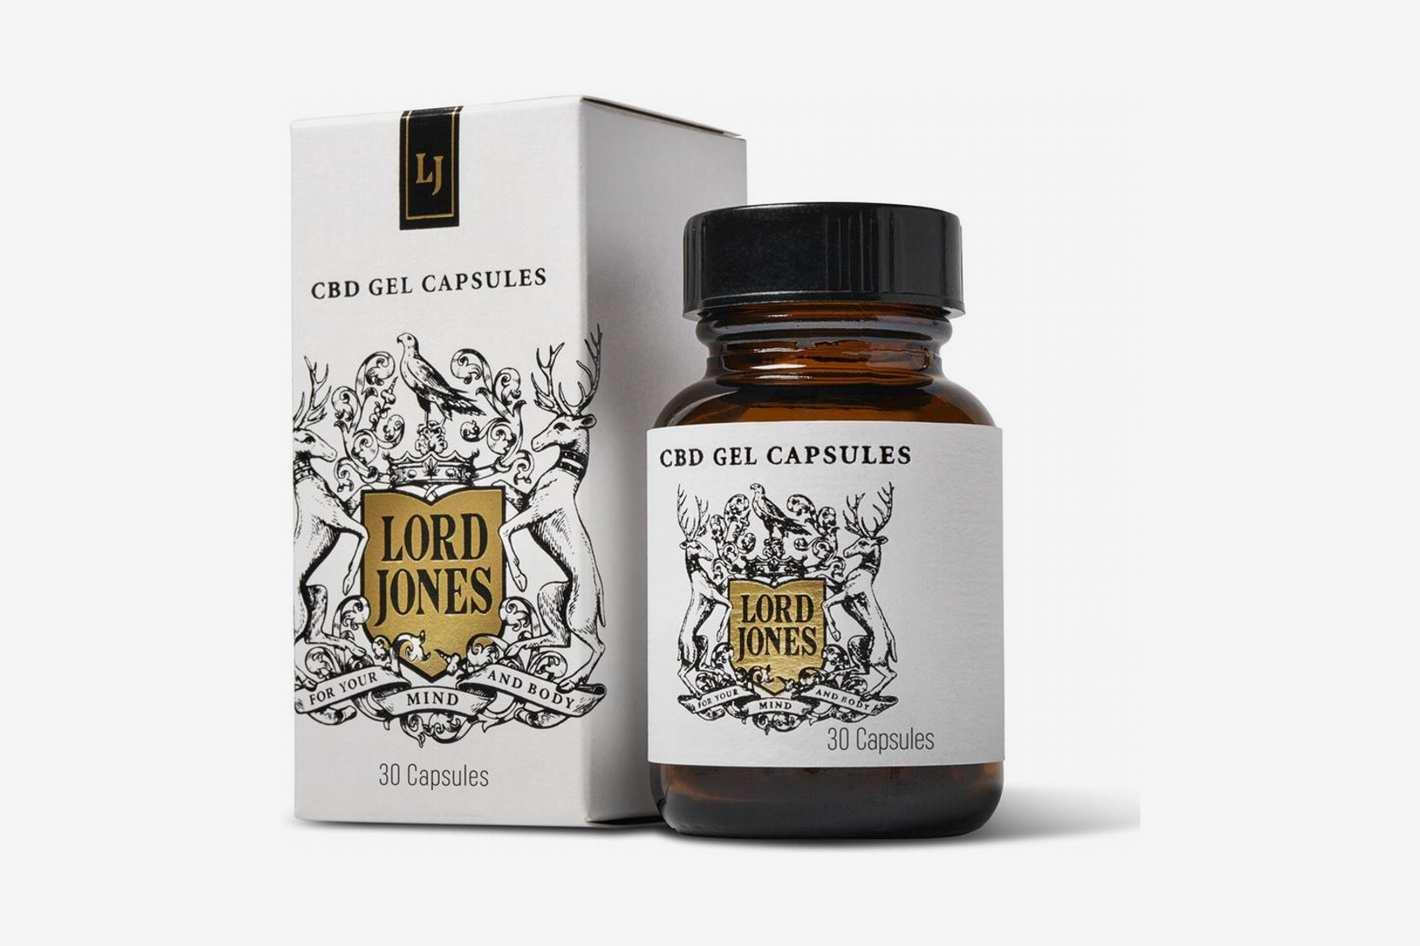 Lord Jones High CBD Gel Capsules